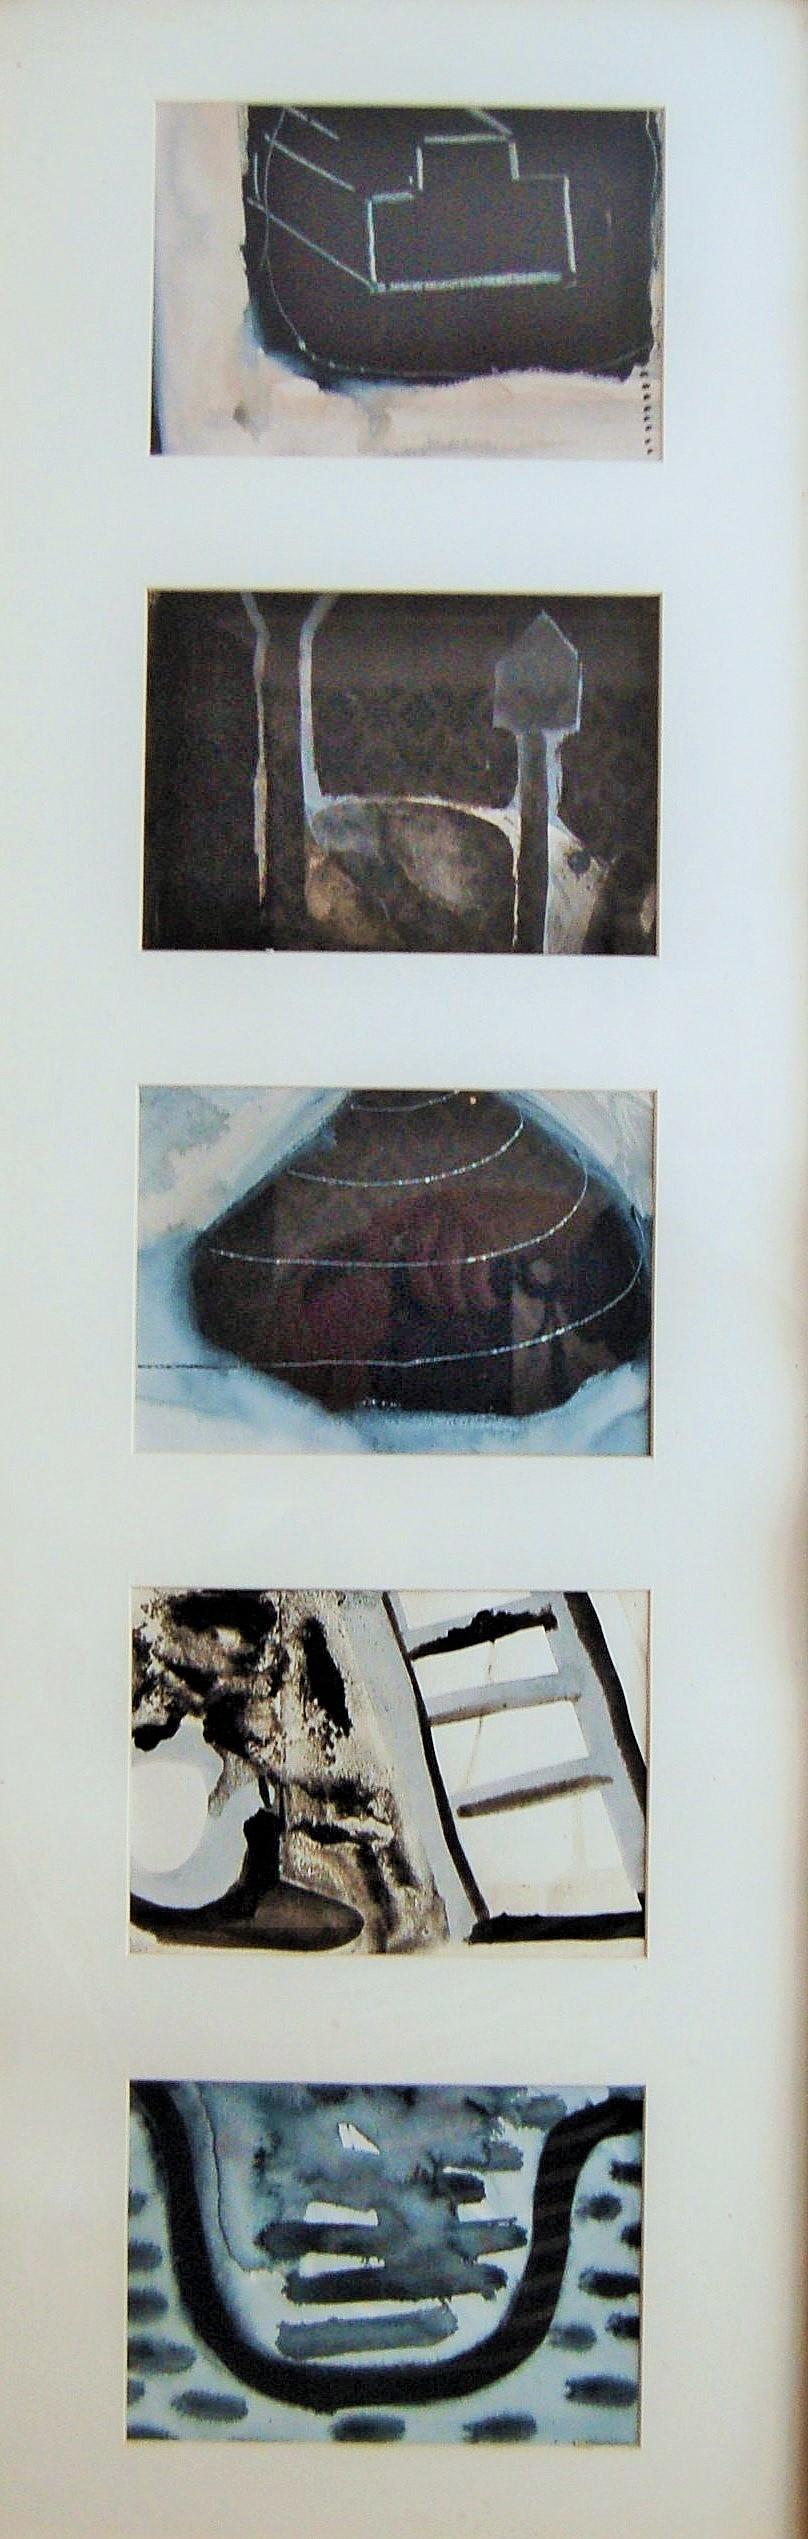 Ron Thompson - Paintings (4)